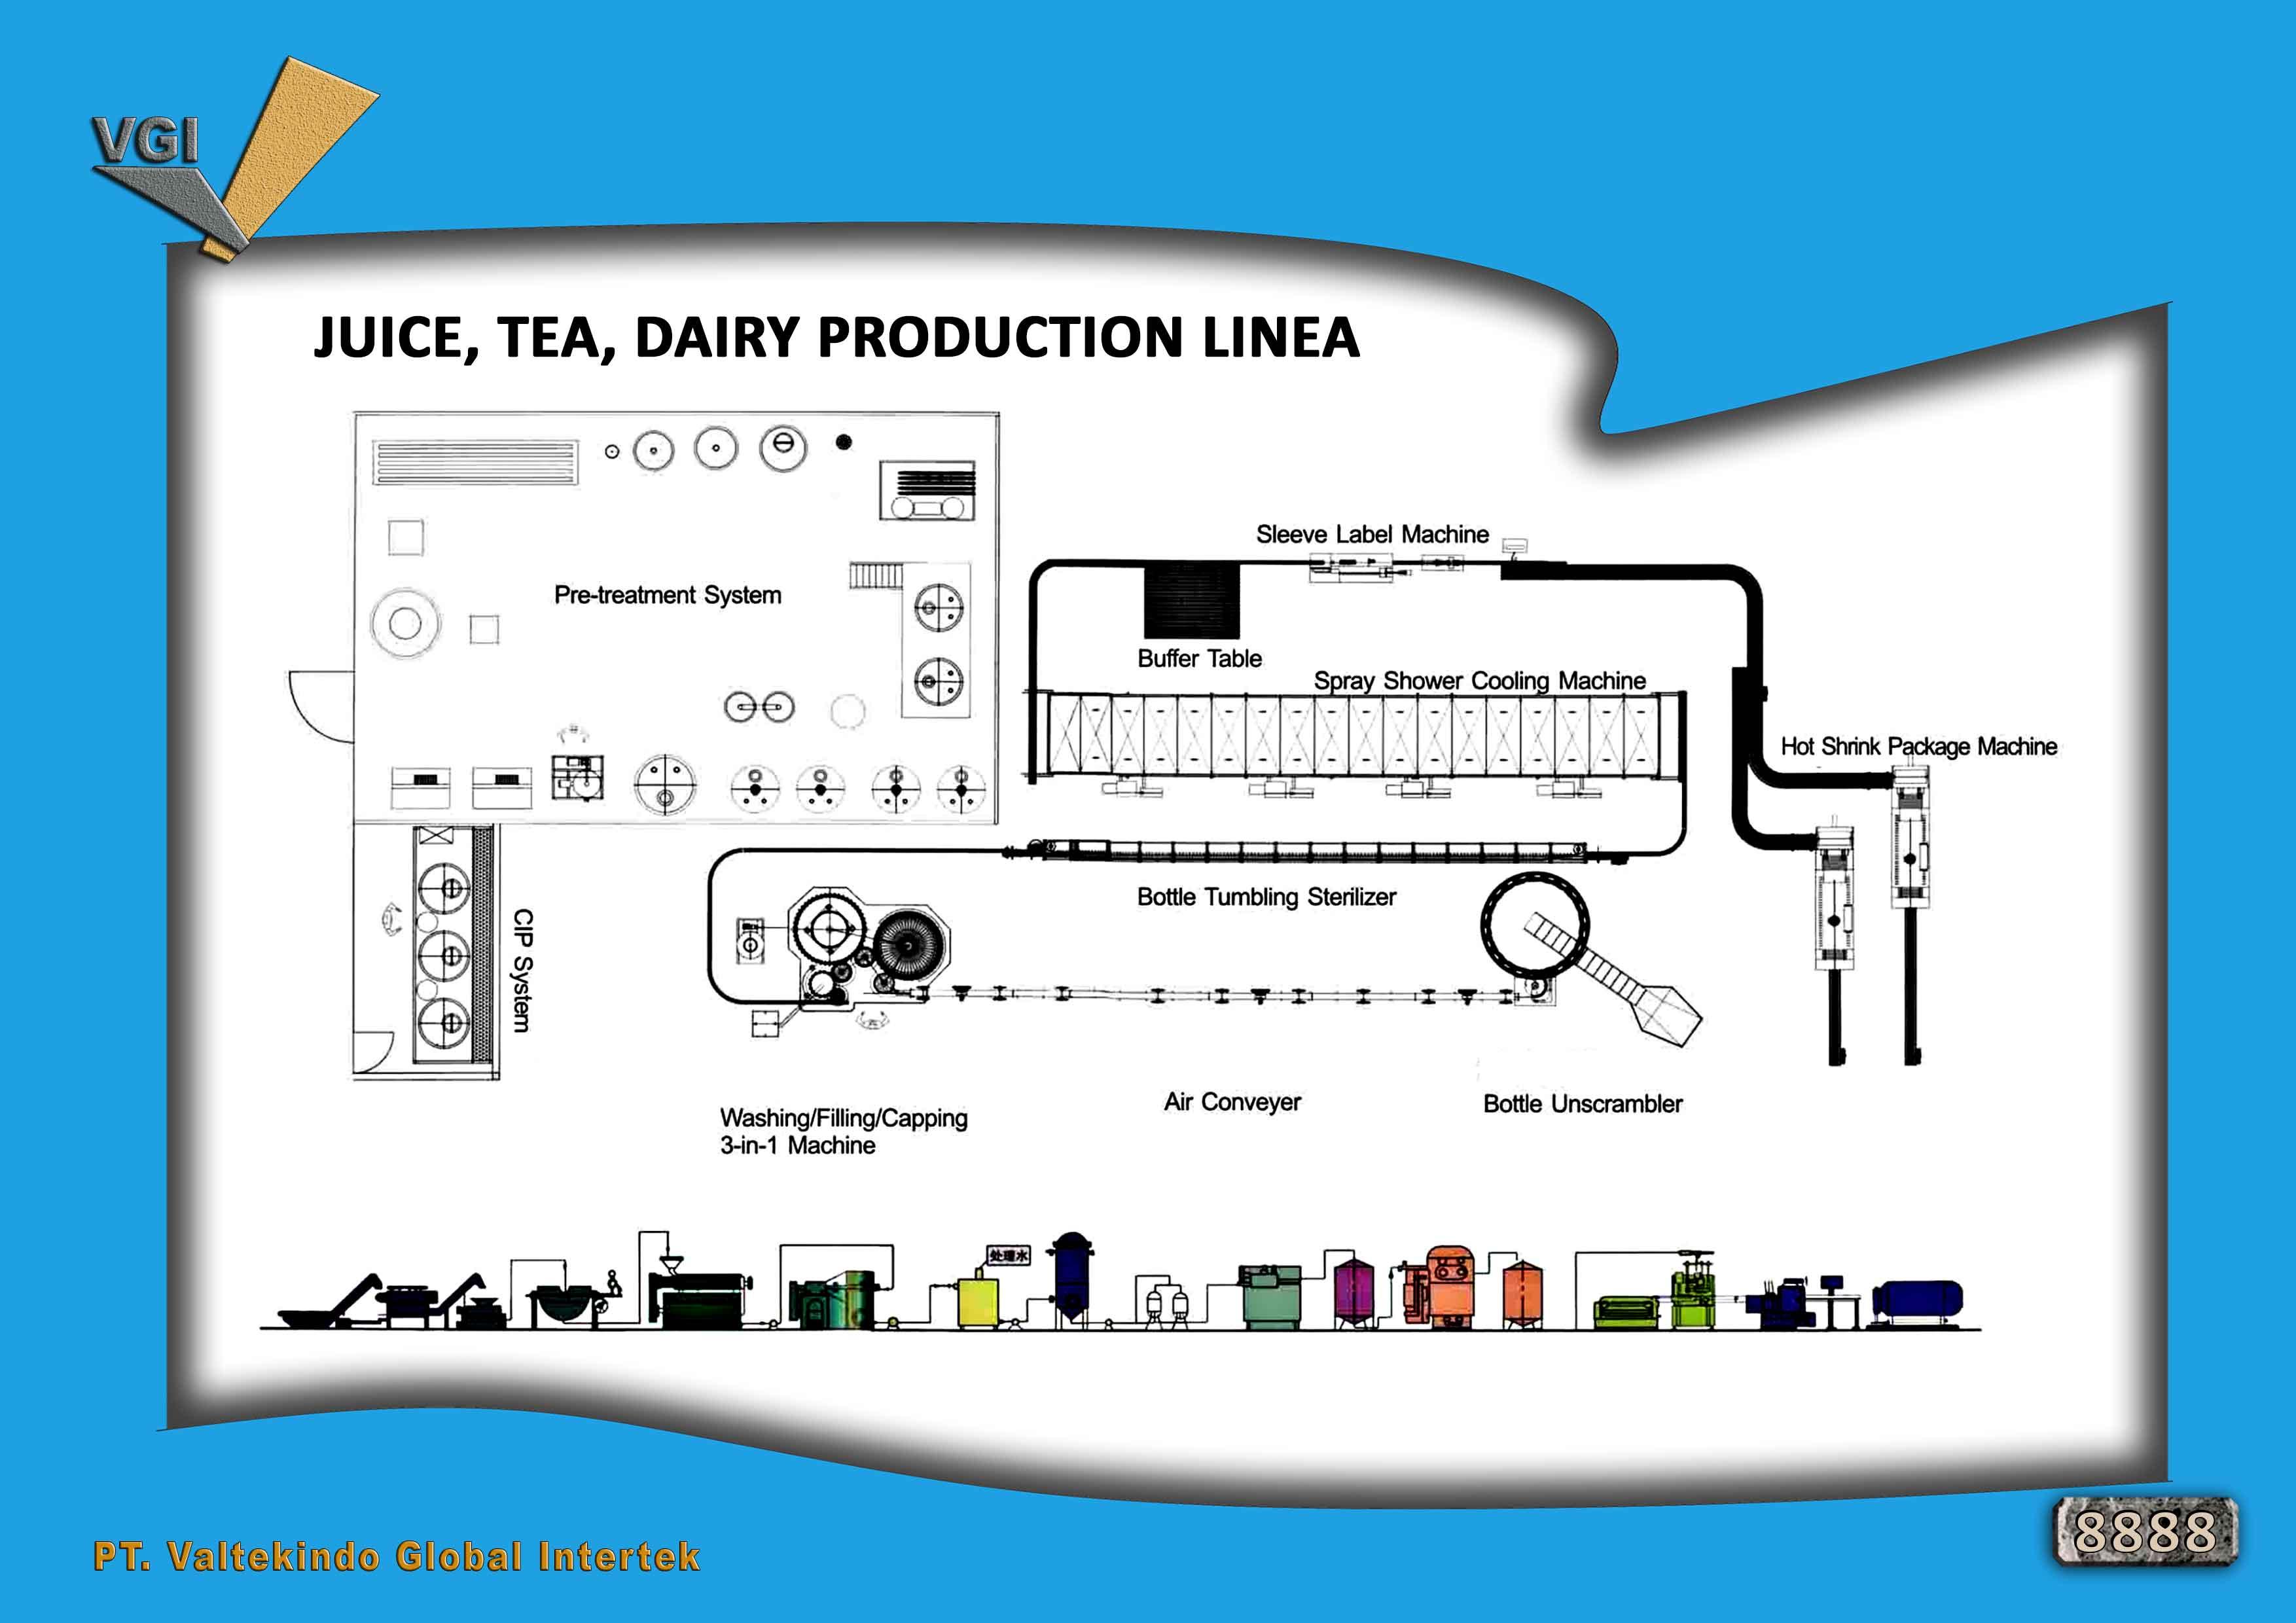 jual mesin Juice, Tea, Dairy Production Juice, Tea, Dairy Production